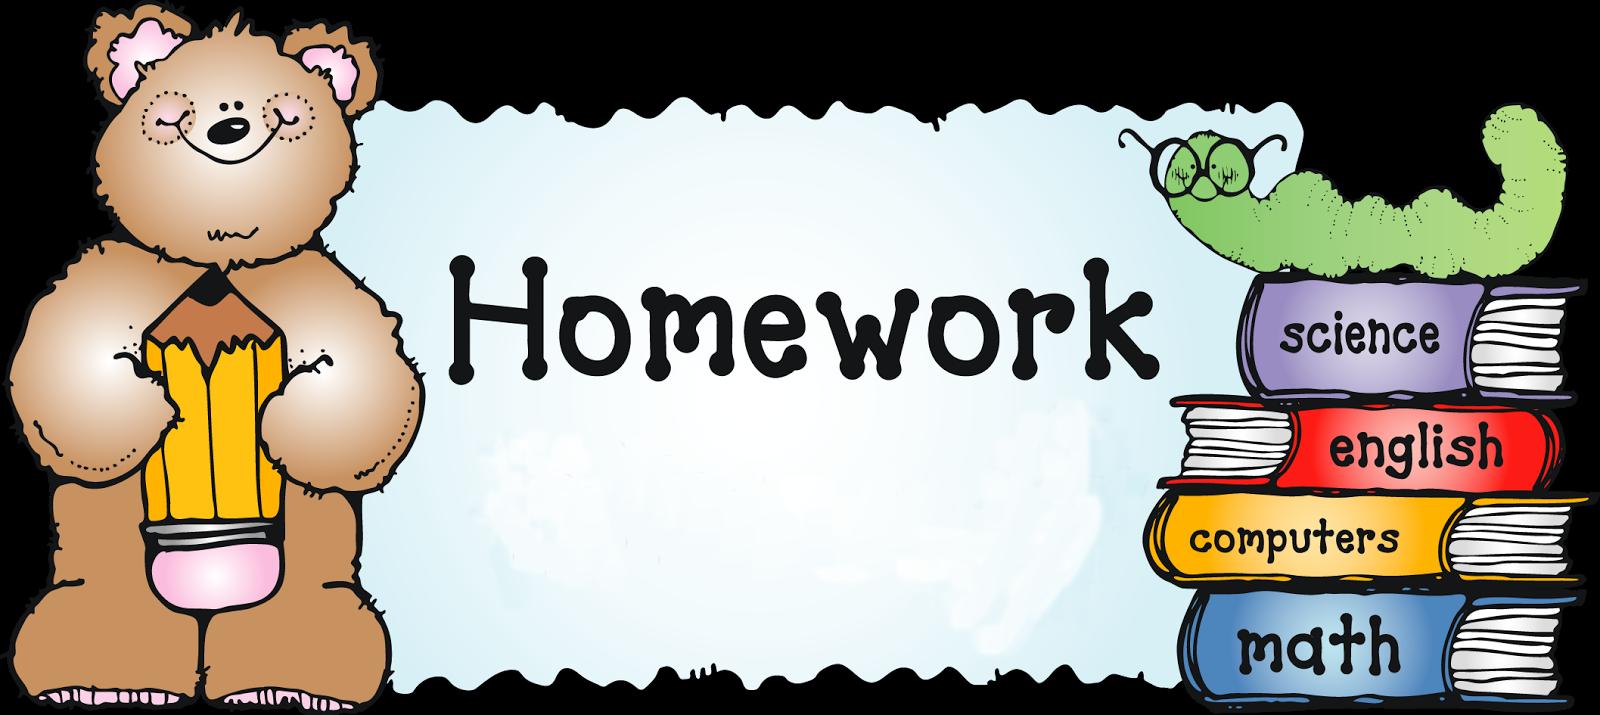 Clipart homework english homework. Mrs rogers nd grade